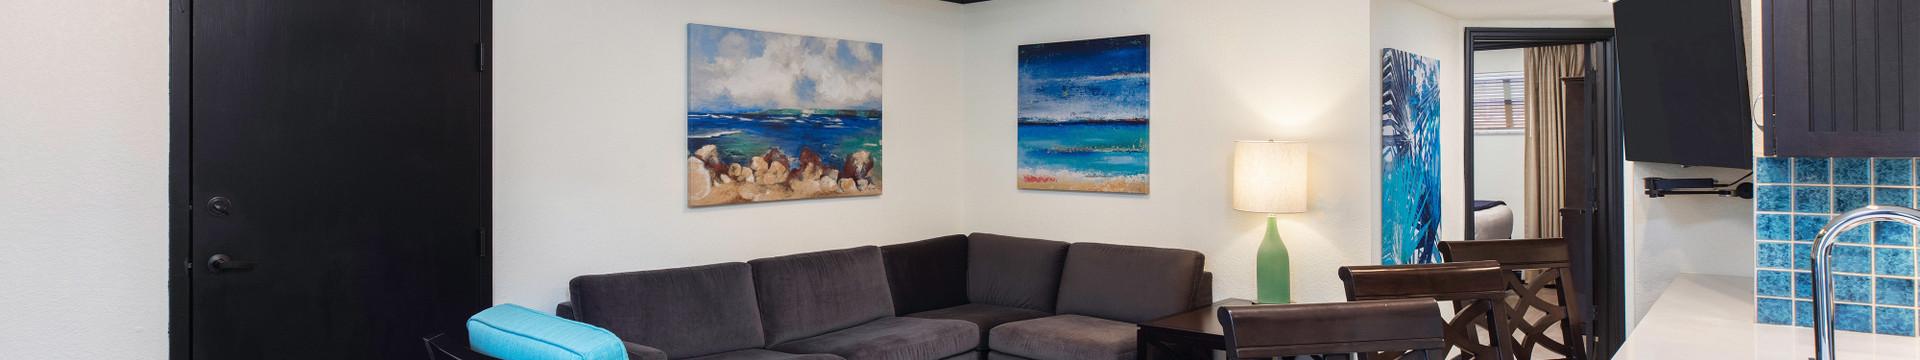 Group Hotel Room Blocks In Cocoa Beach | Westgate Cocoa Beach Resort